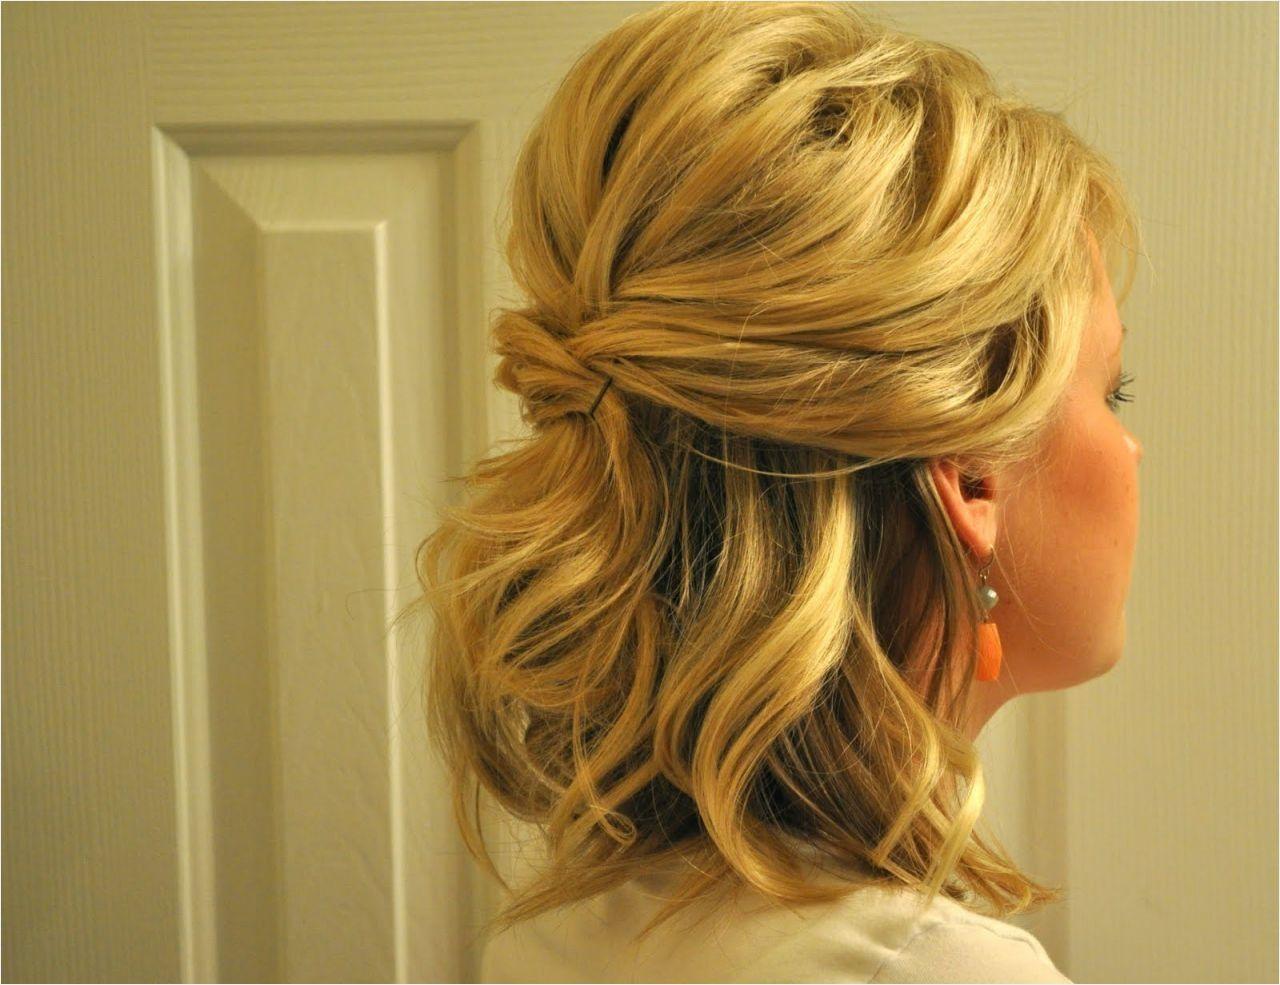 Updos For Medium Hair Half Up Half Down Half Up Half Down Advanced Wedding Hair Medium Length Hair Styles Medium Hair Styles Wedding Hairstyles For Medium Hair